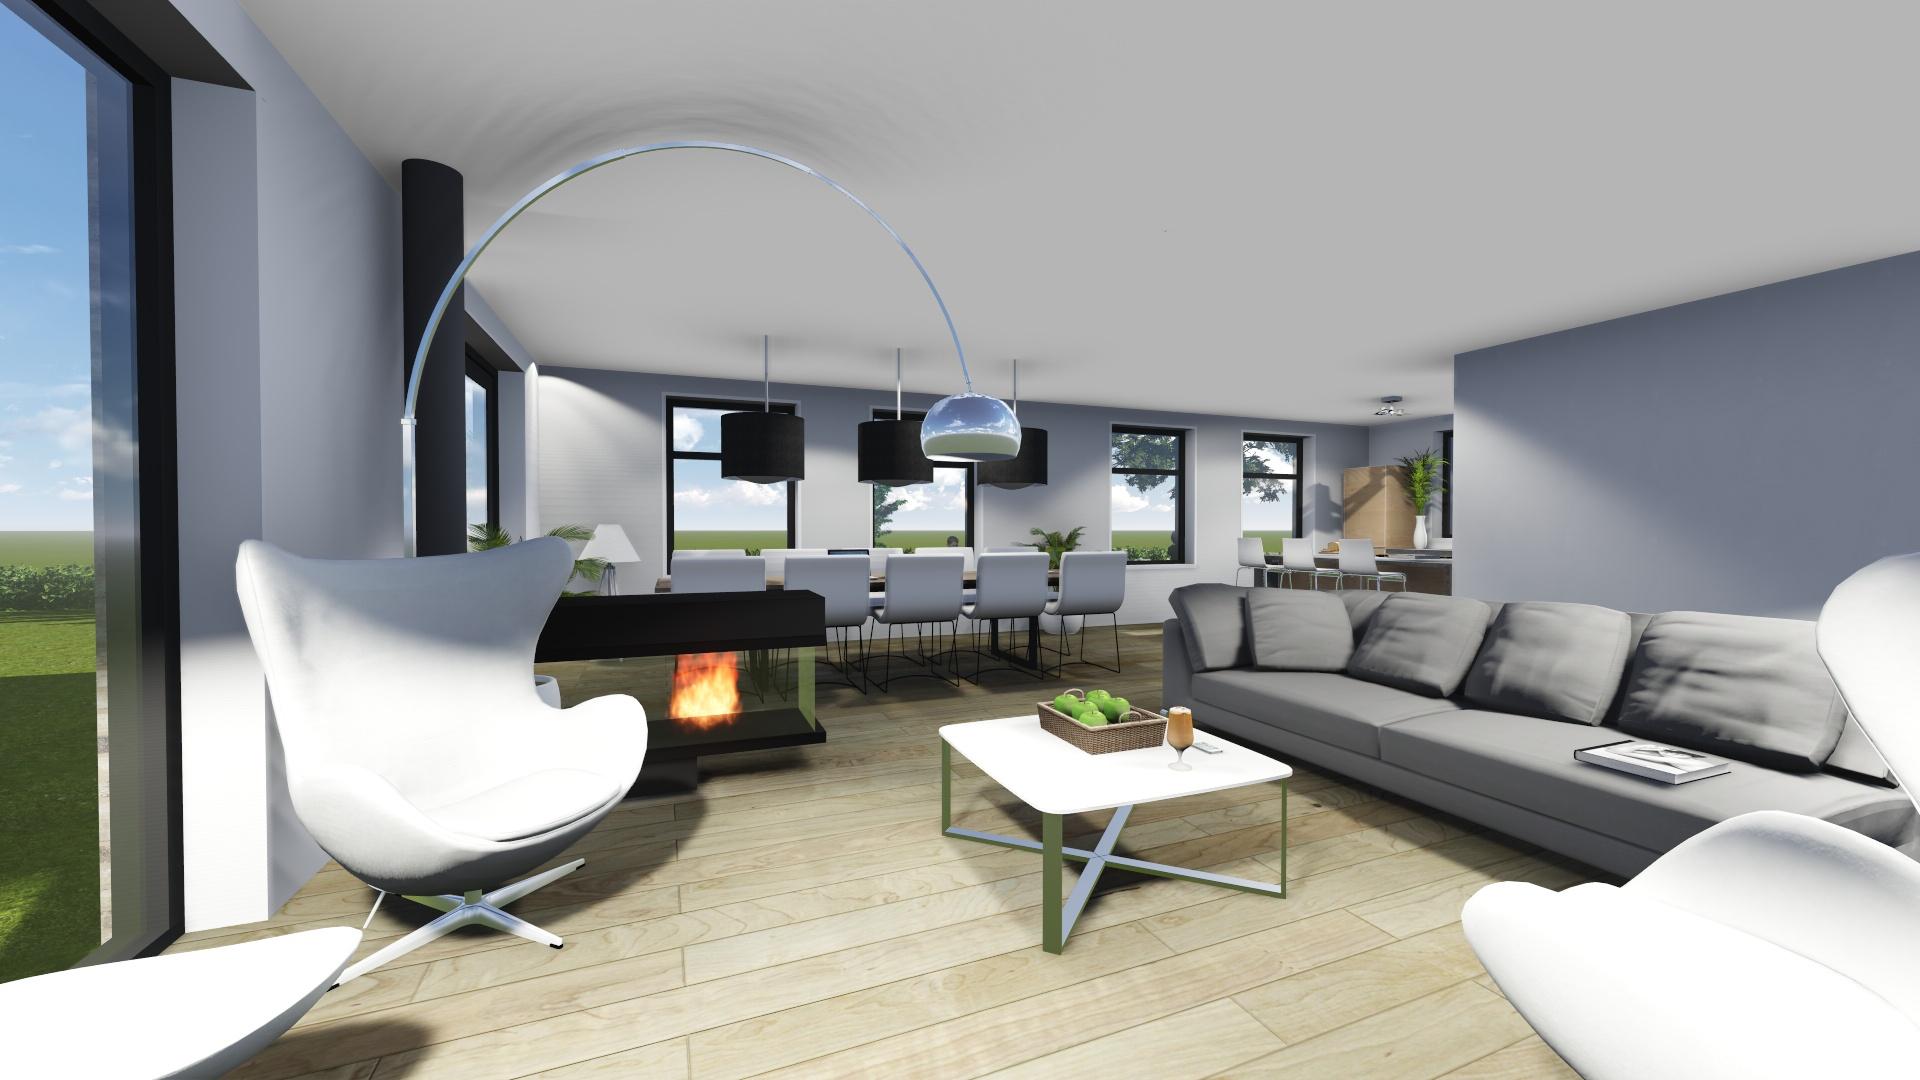 Woonkamer interieur woning Leeuwarden | Bernhard Kuiper | Visuals